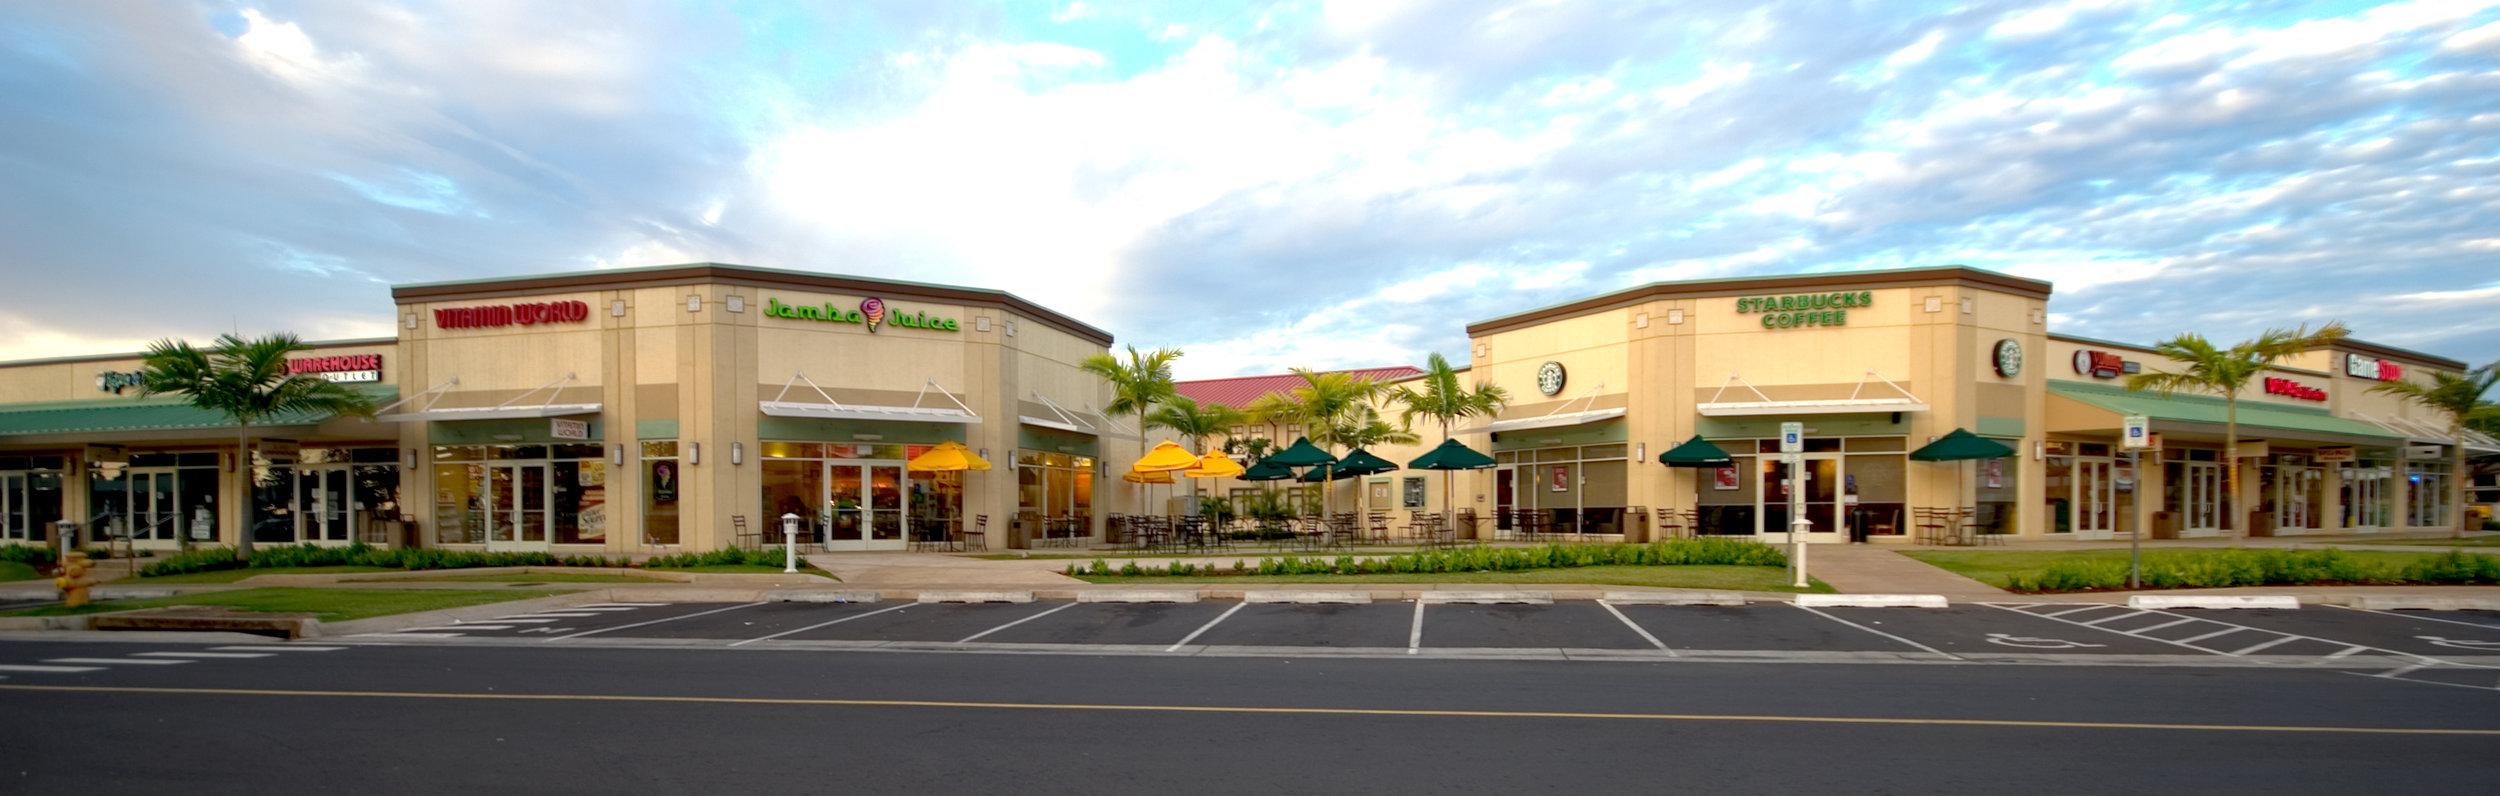 Moanalua Shopping Center 3.jpg